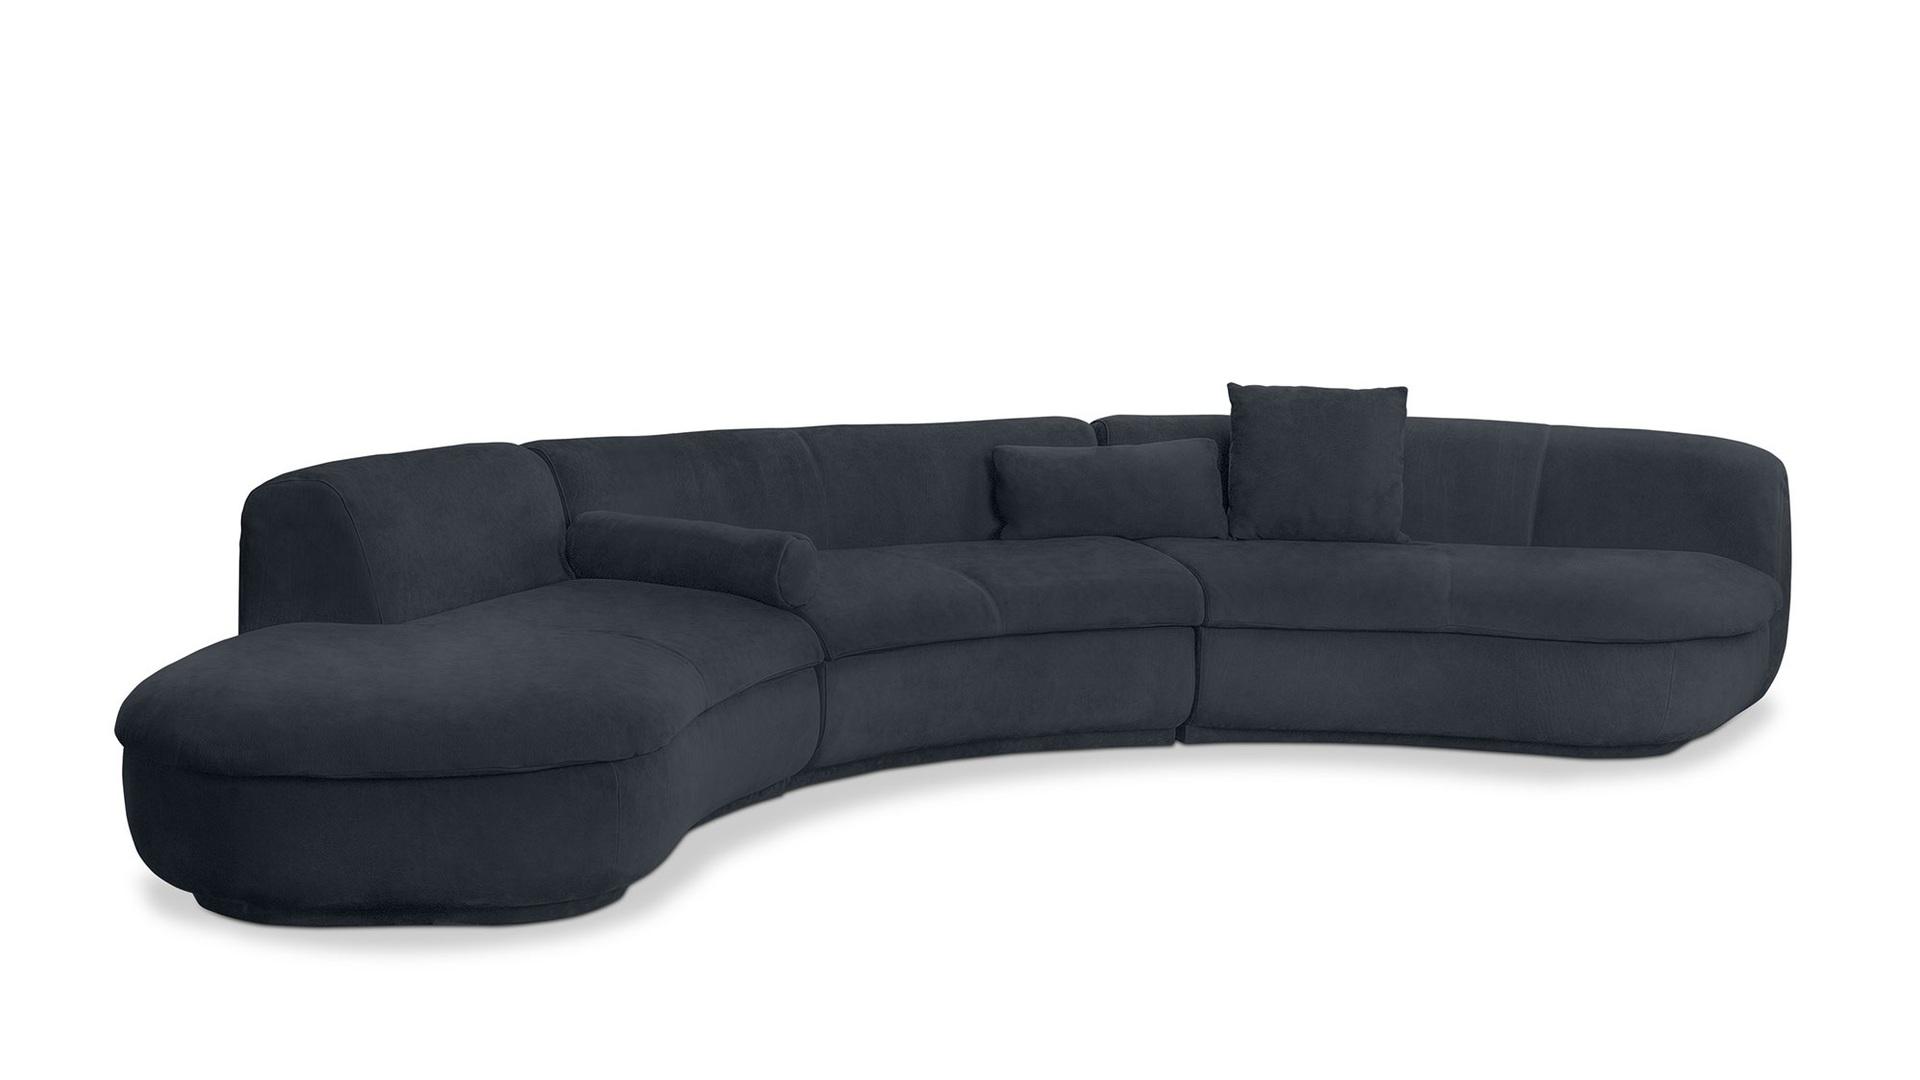 Baxter Piaf sofa 4.jpg